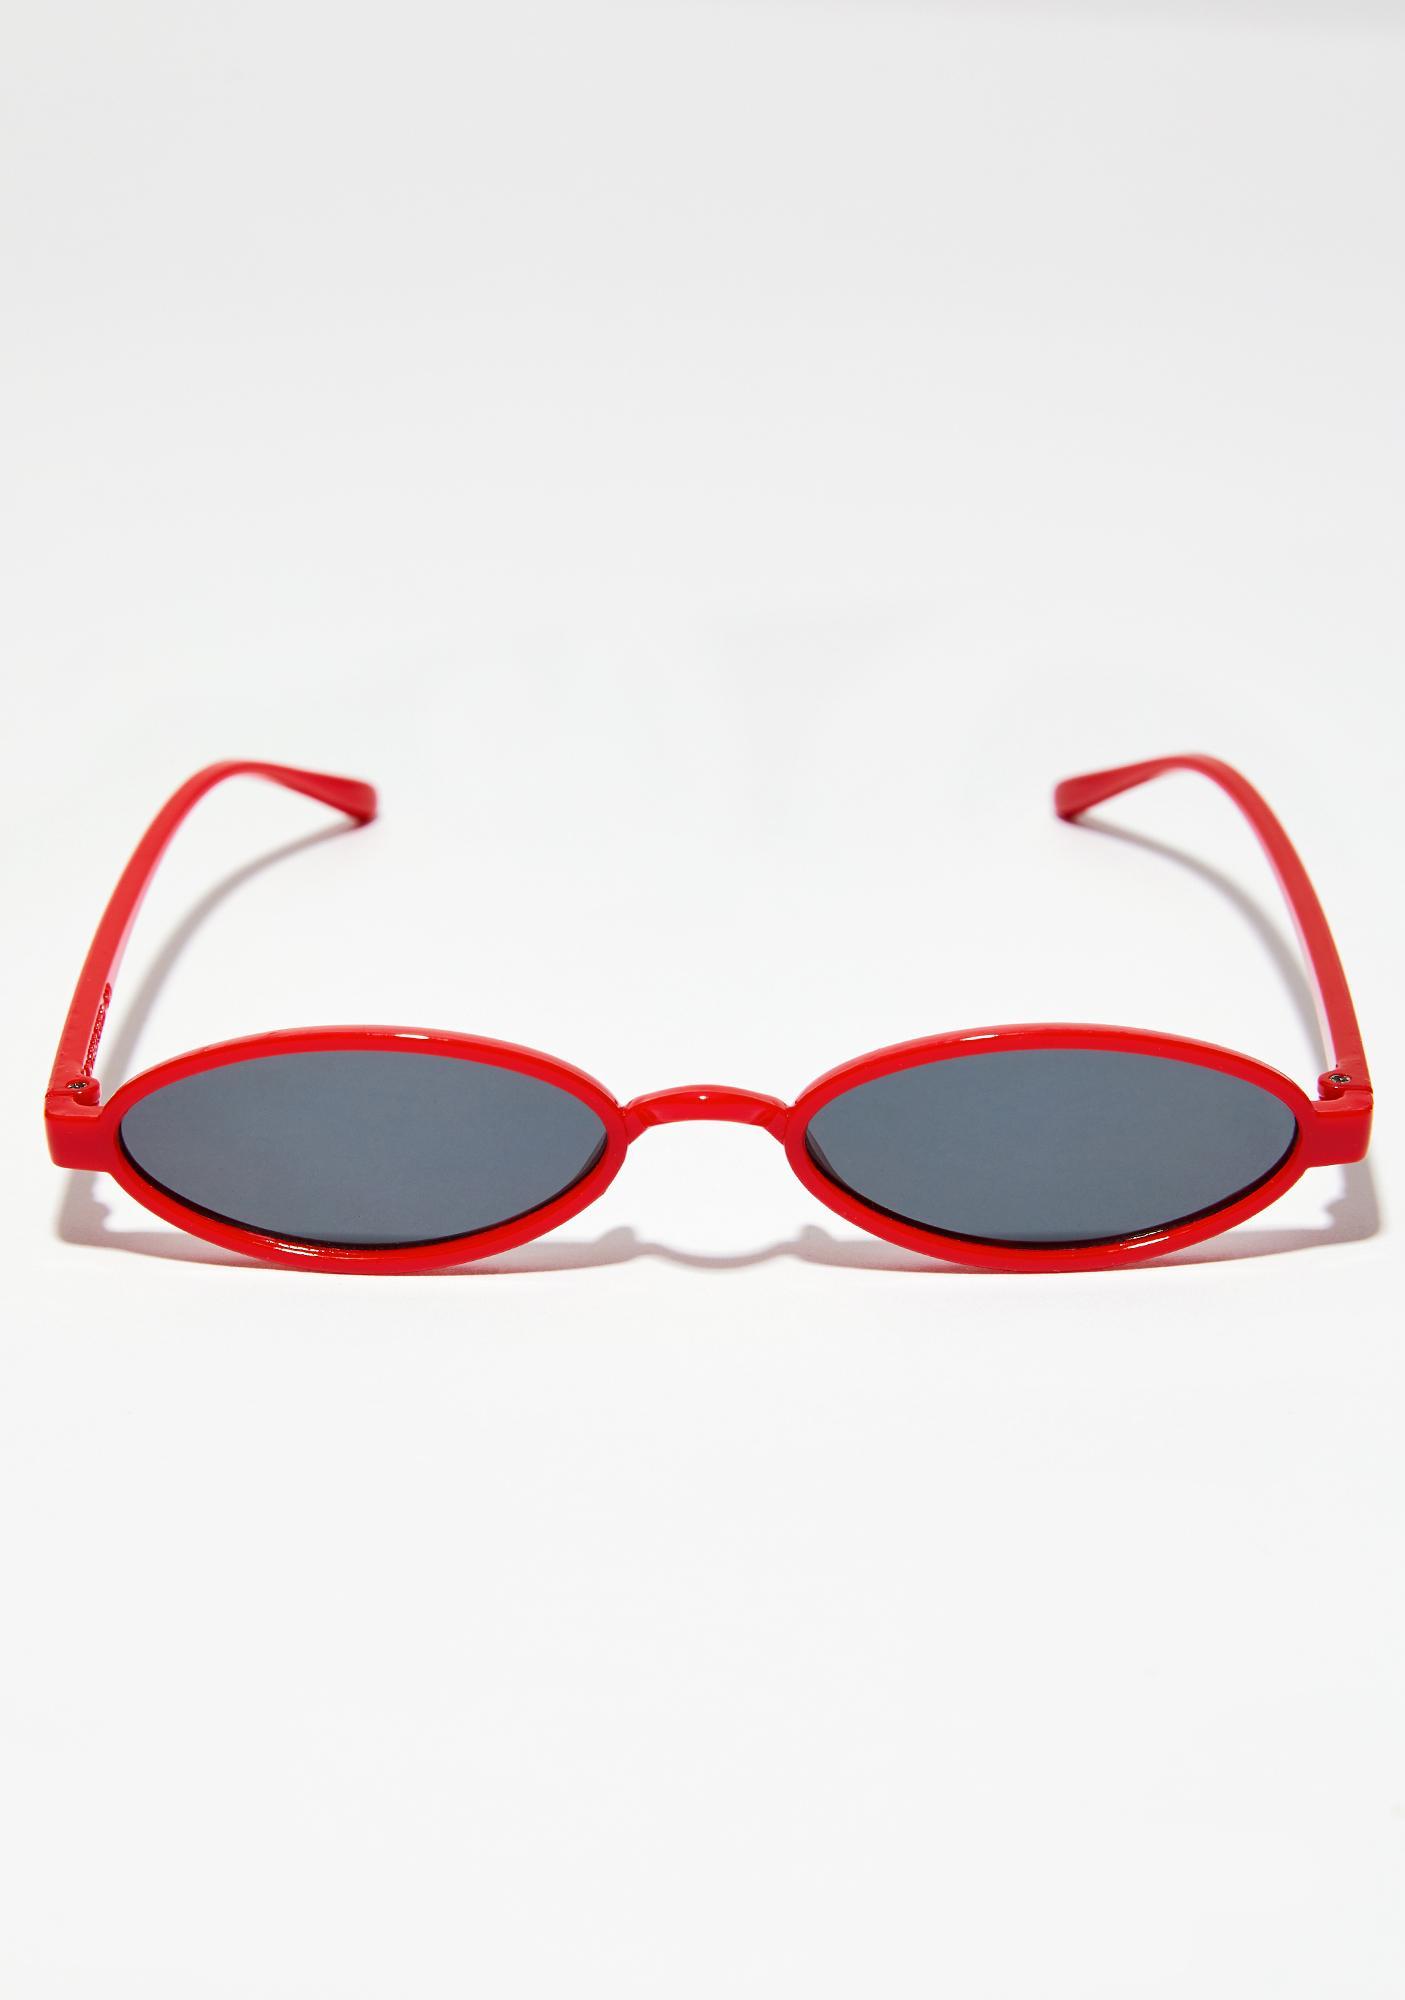 Love Steal Ur Sunshine Sunglasses